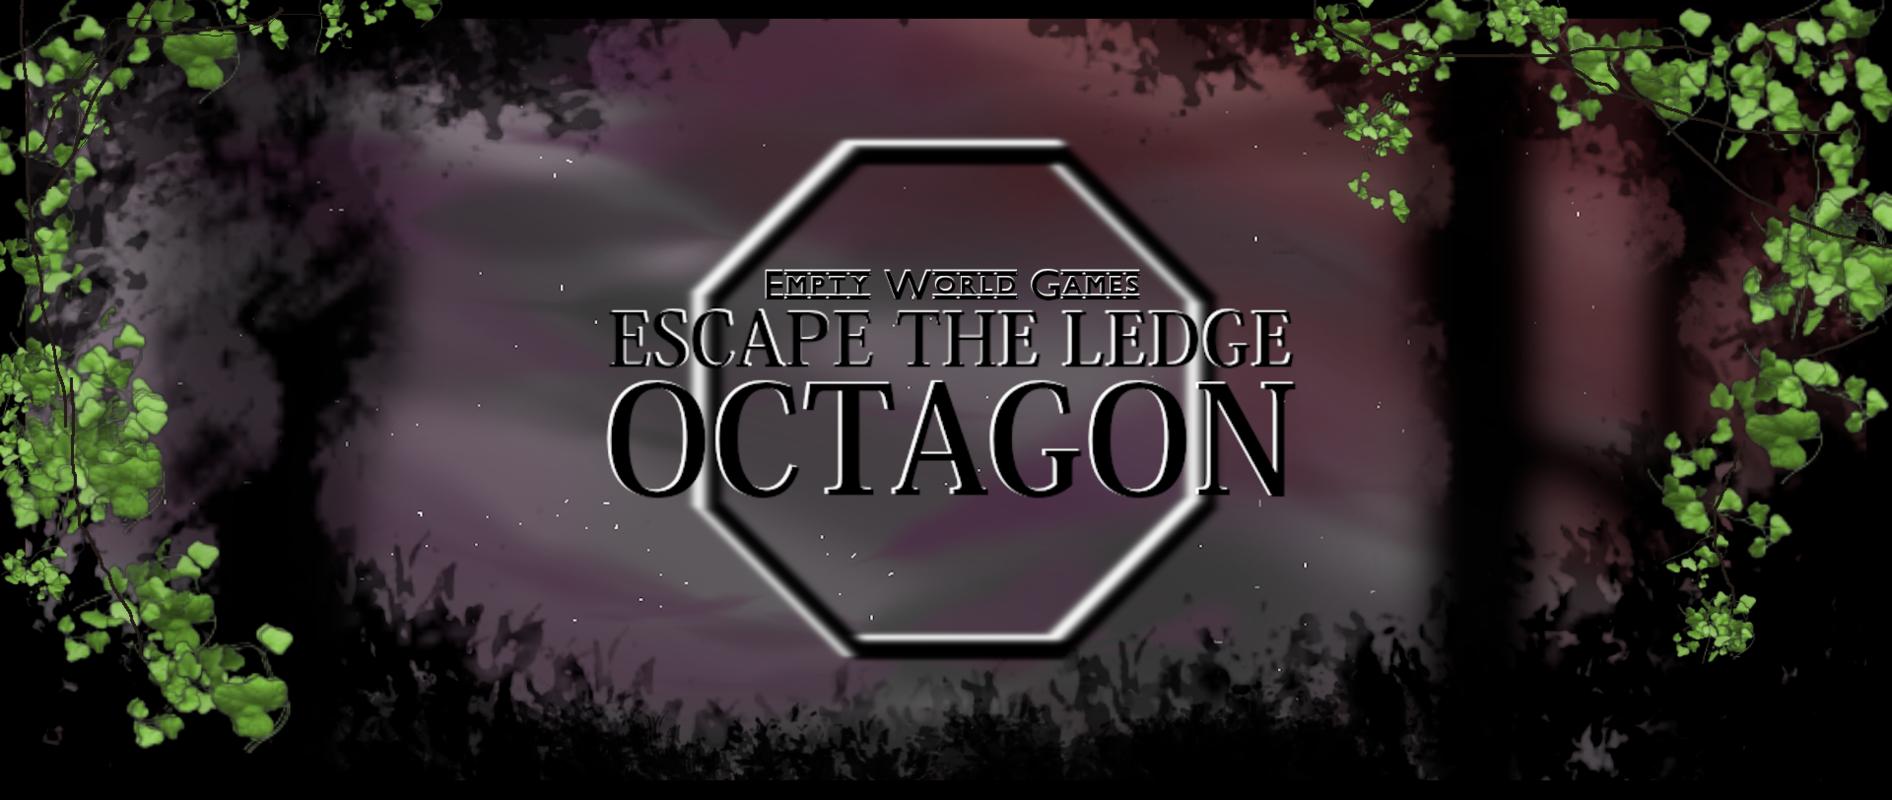 Play Escape the Ledge: Octagon